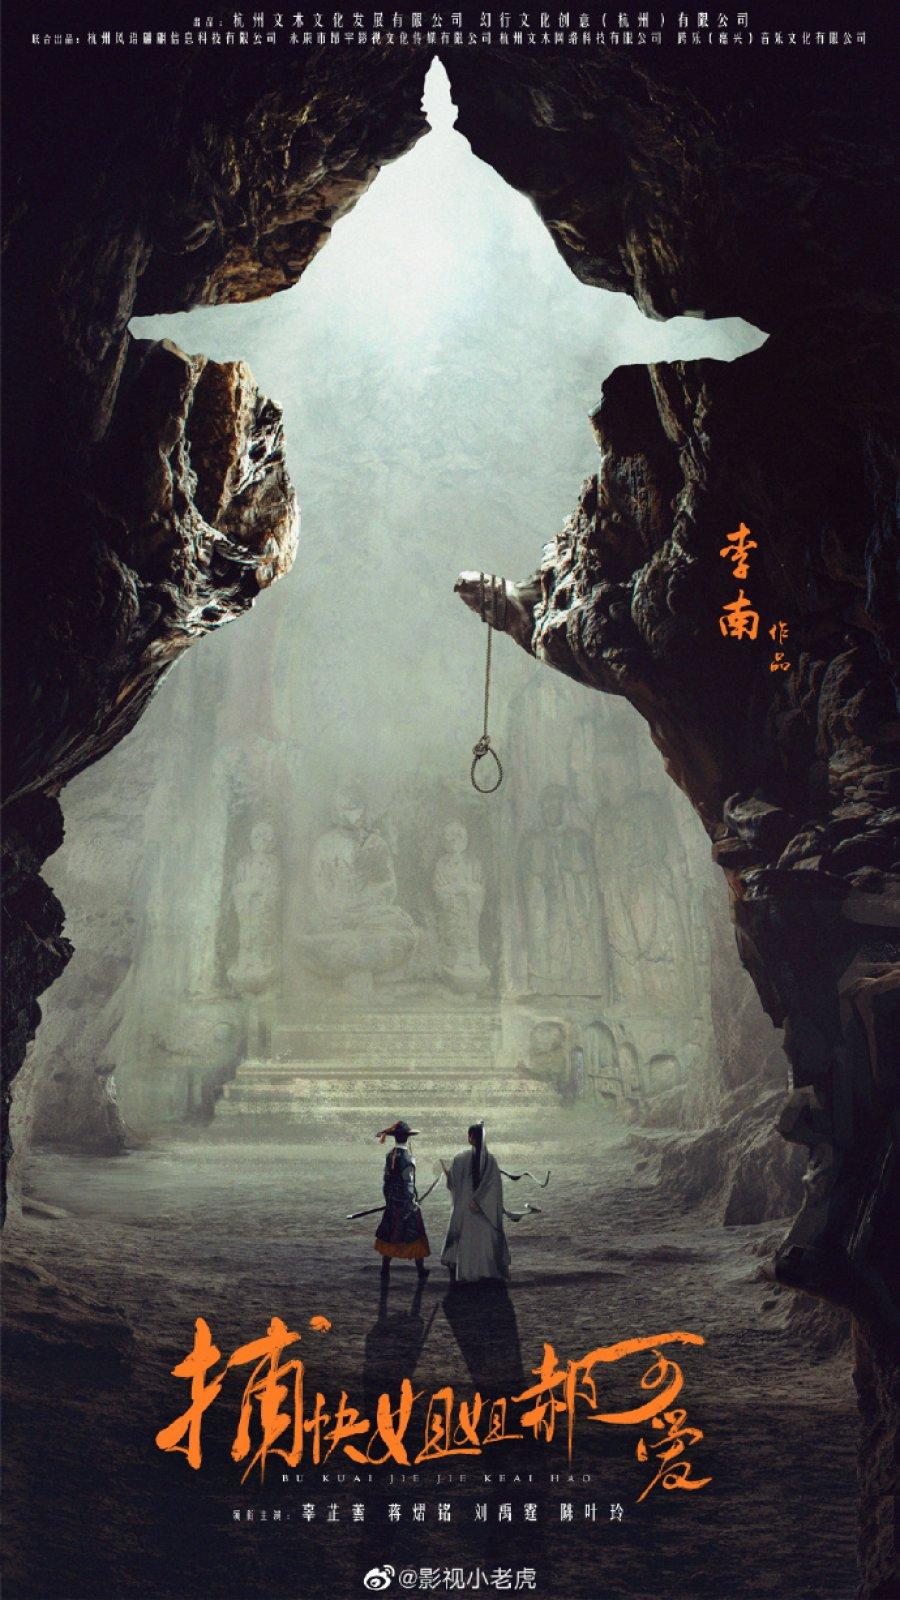 Image مسلسل Pu Kuai Jie Jie Hao Ke Ai مترجم اون لاين